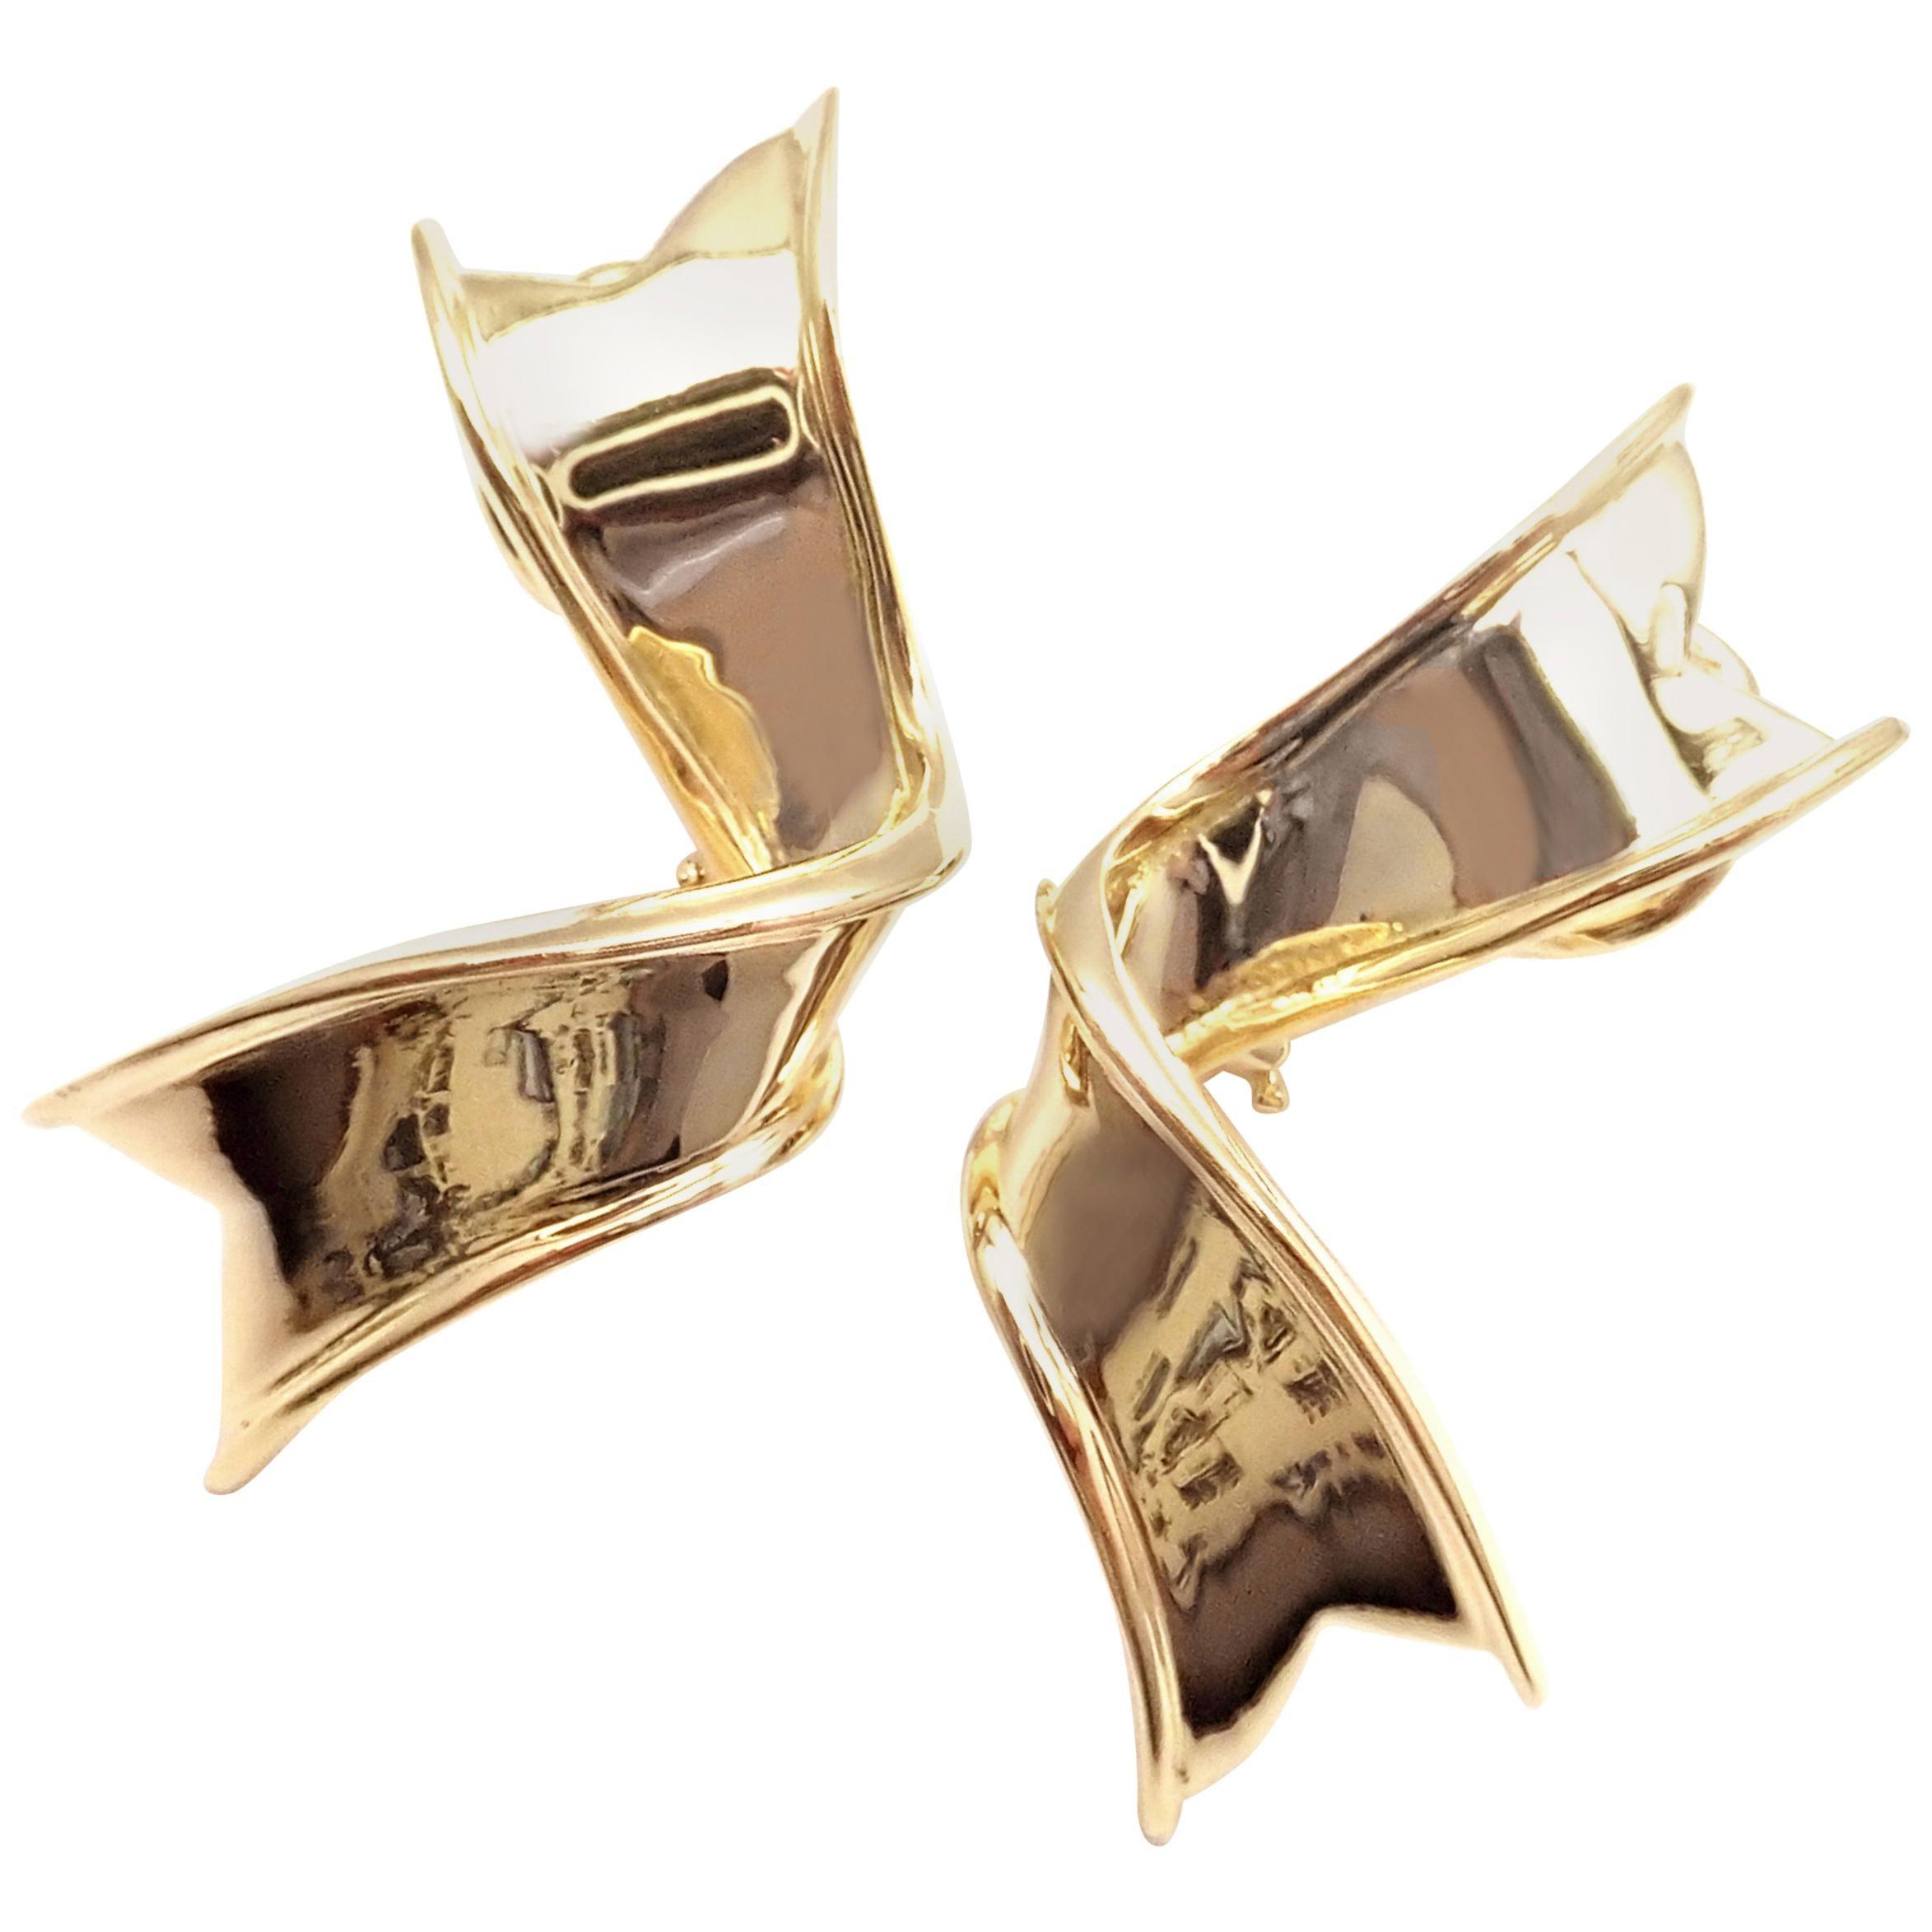 Vintage Tiffany & Co. Ribbon Yellow Gold Earrings